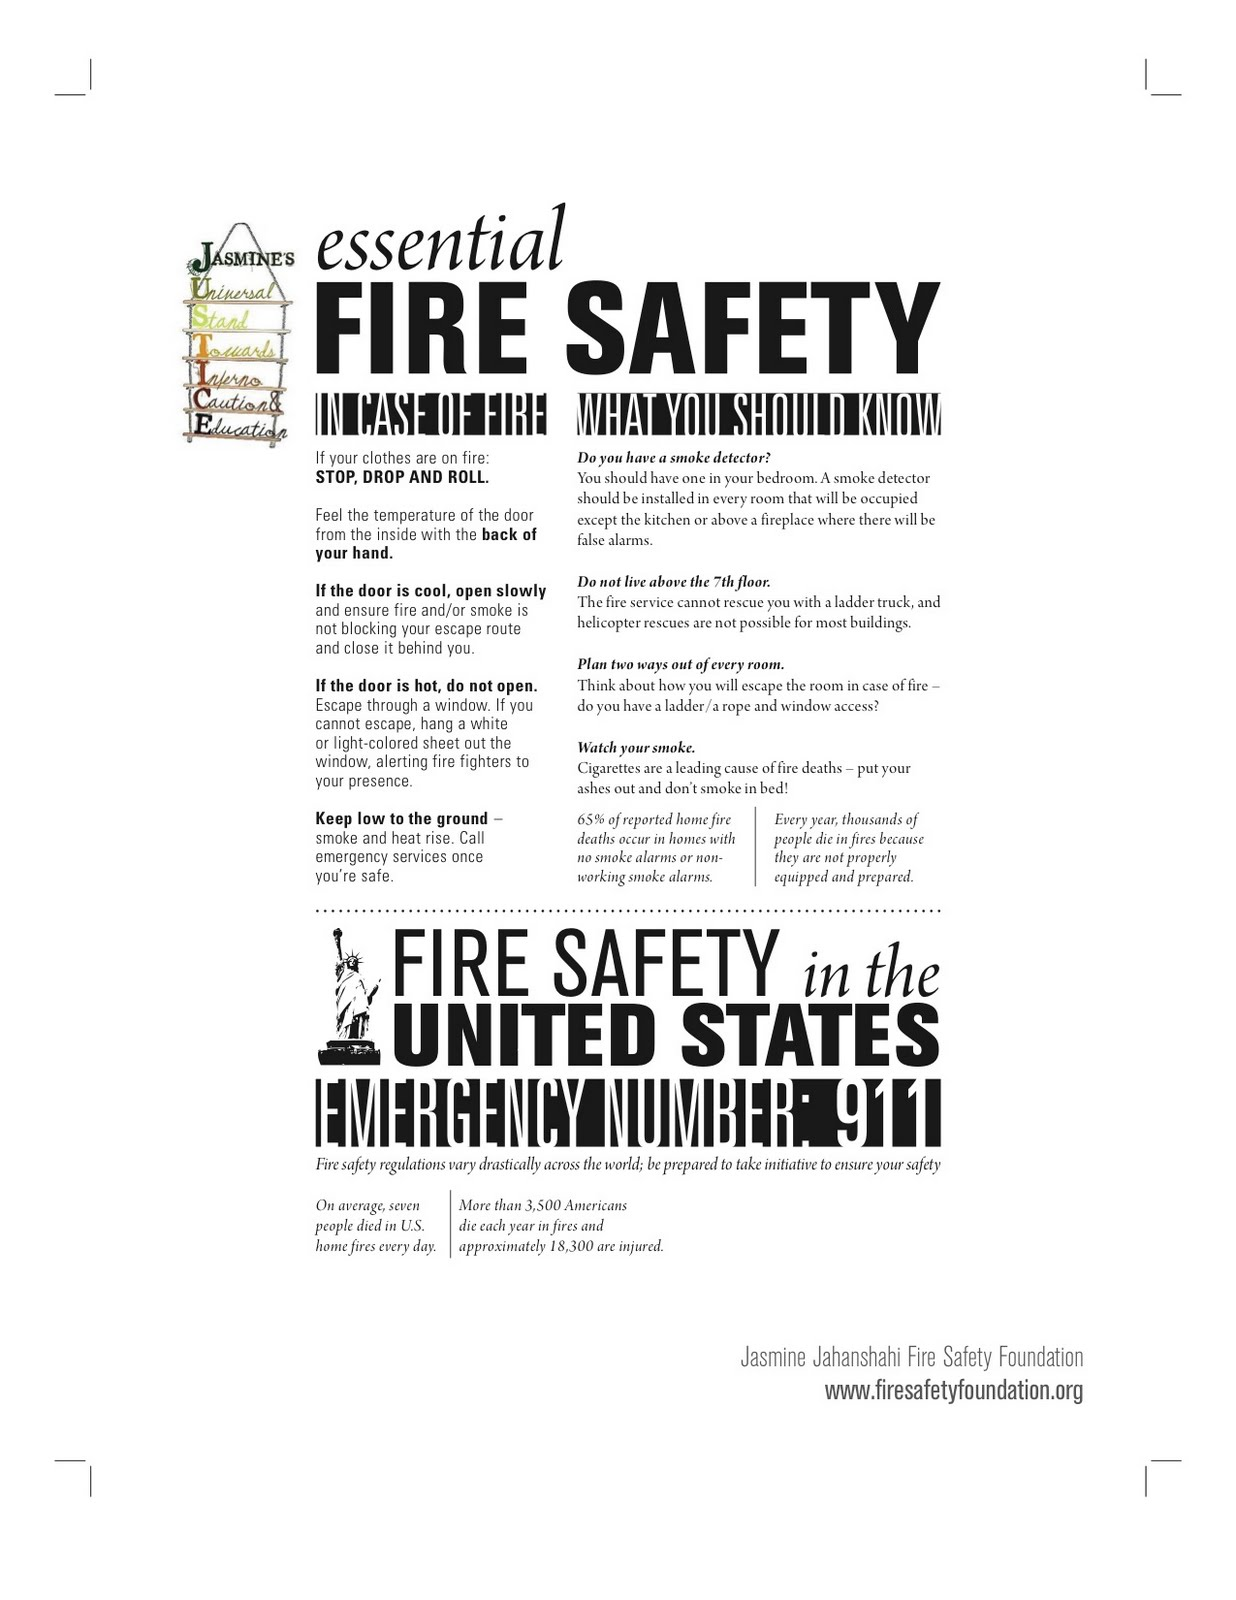 JUSTICE: Sharing Safety: September 2011